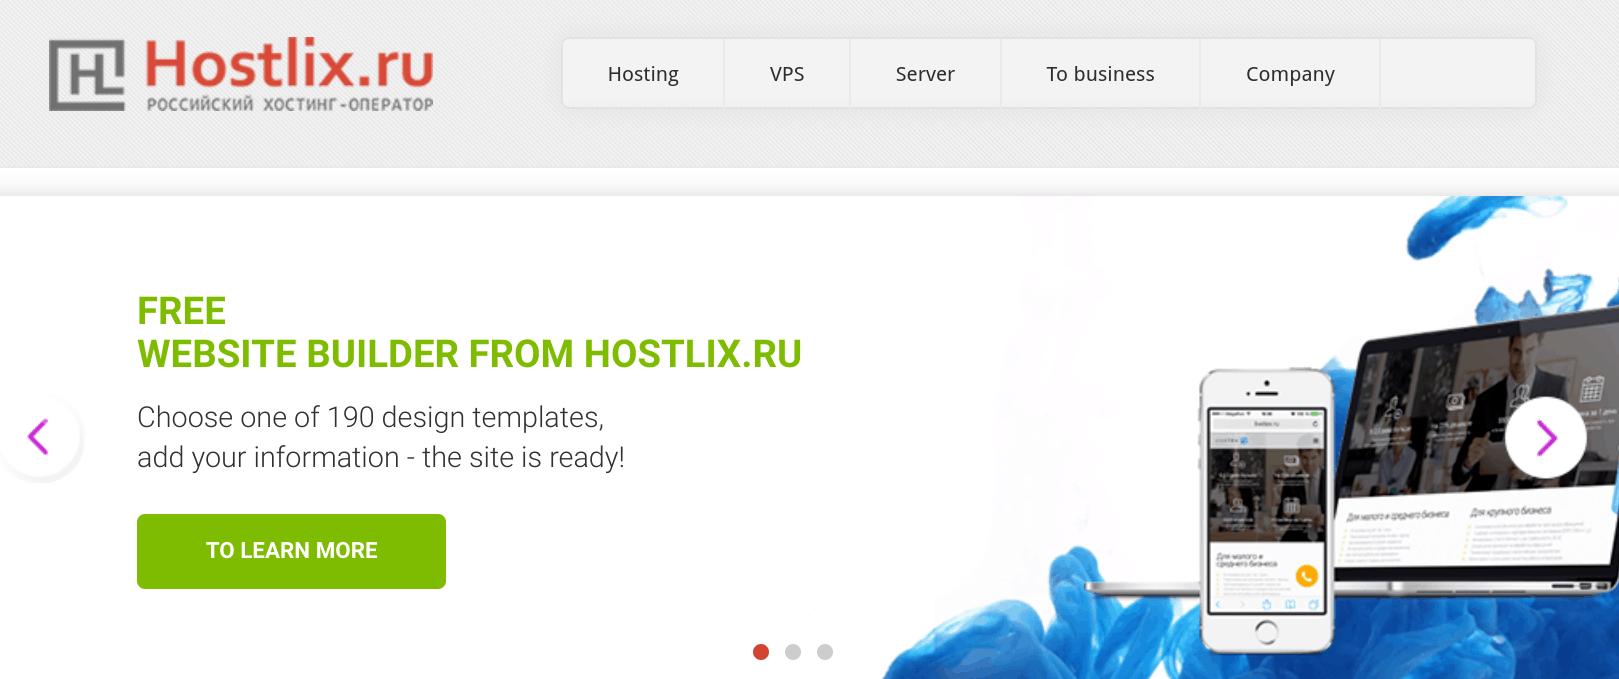 Hostlix.ru